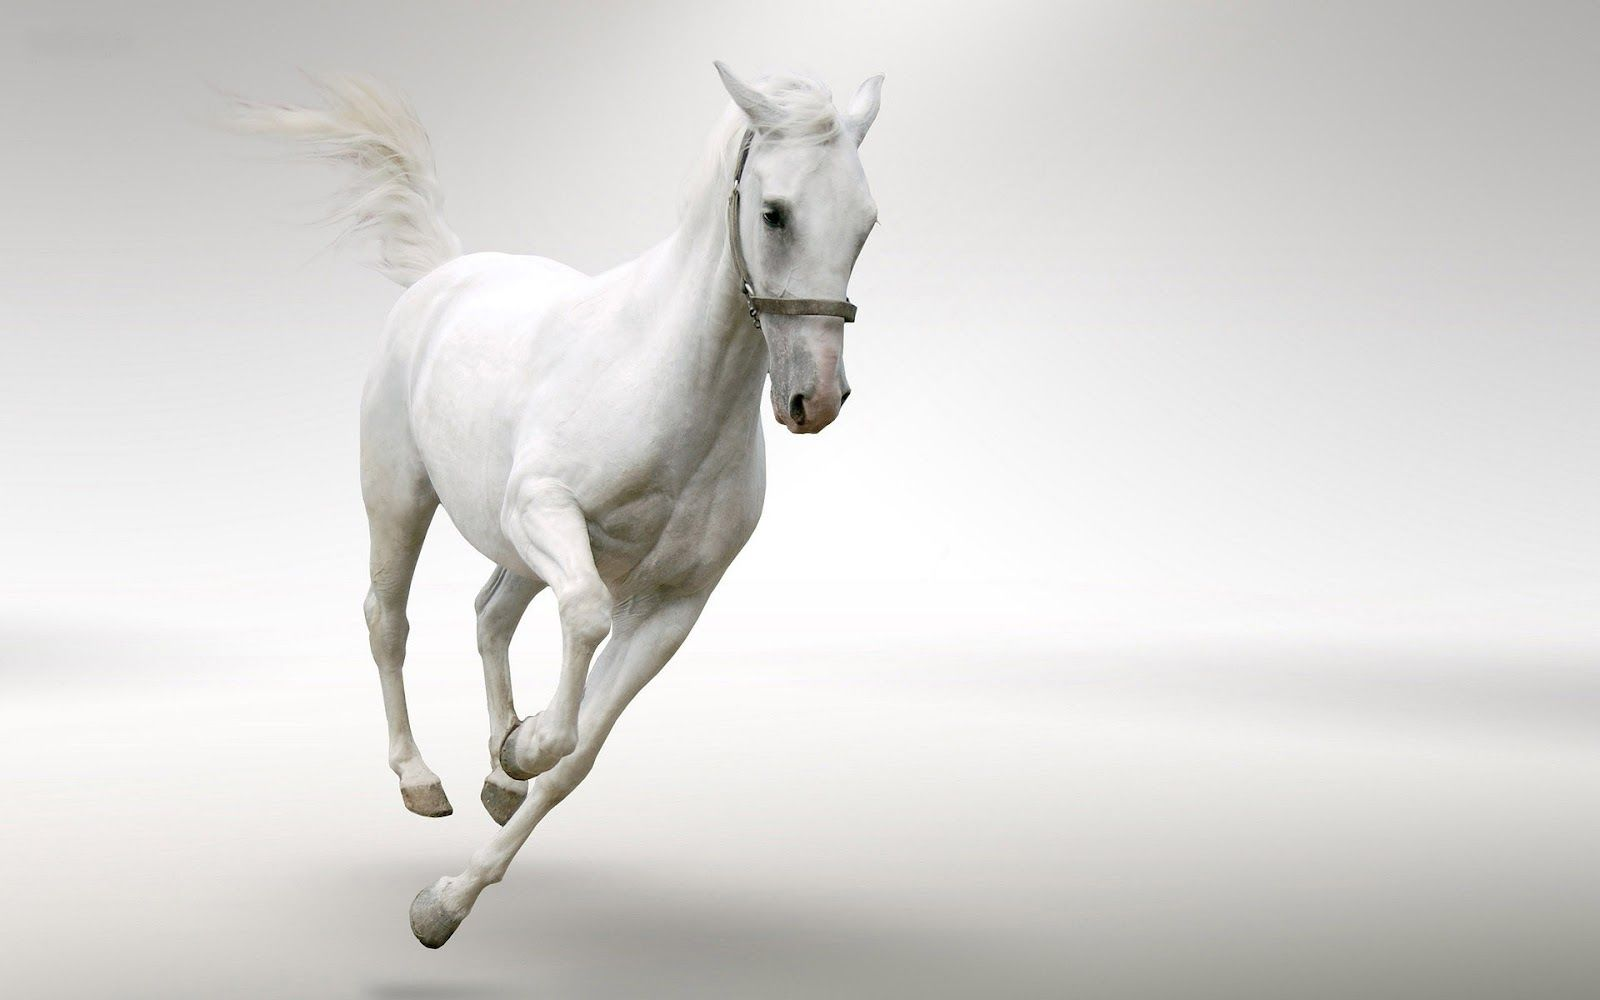 White Horses Running Through Water Or Sea White Horses Horses Horse Wallpaper